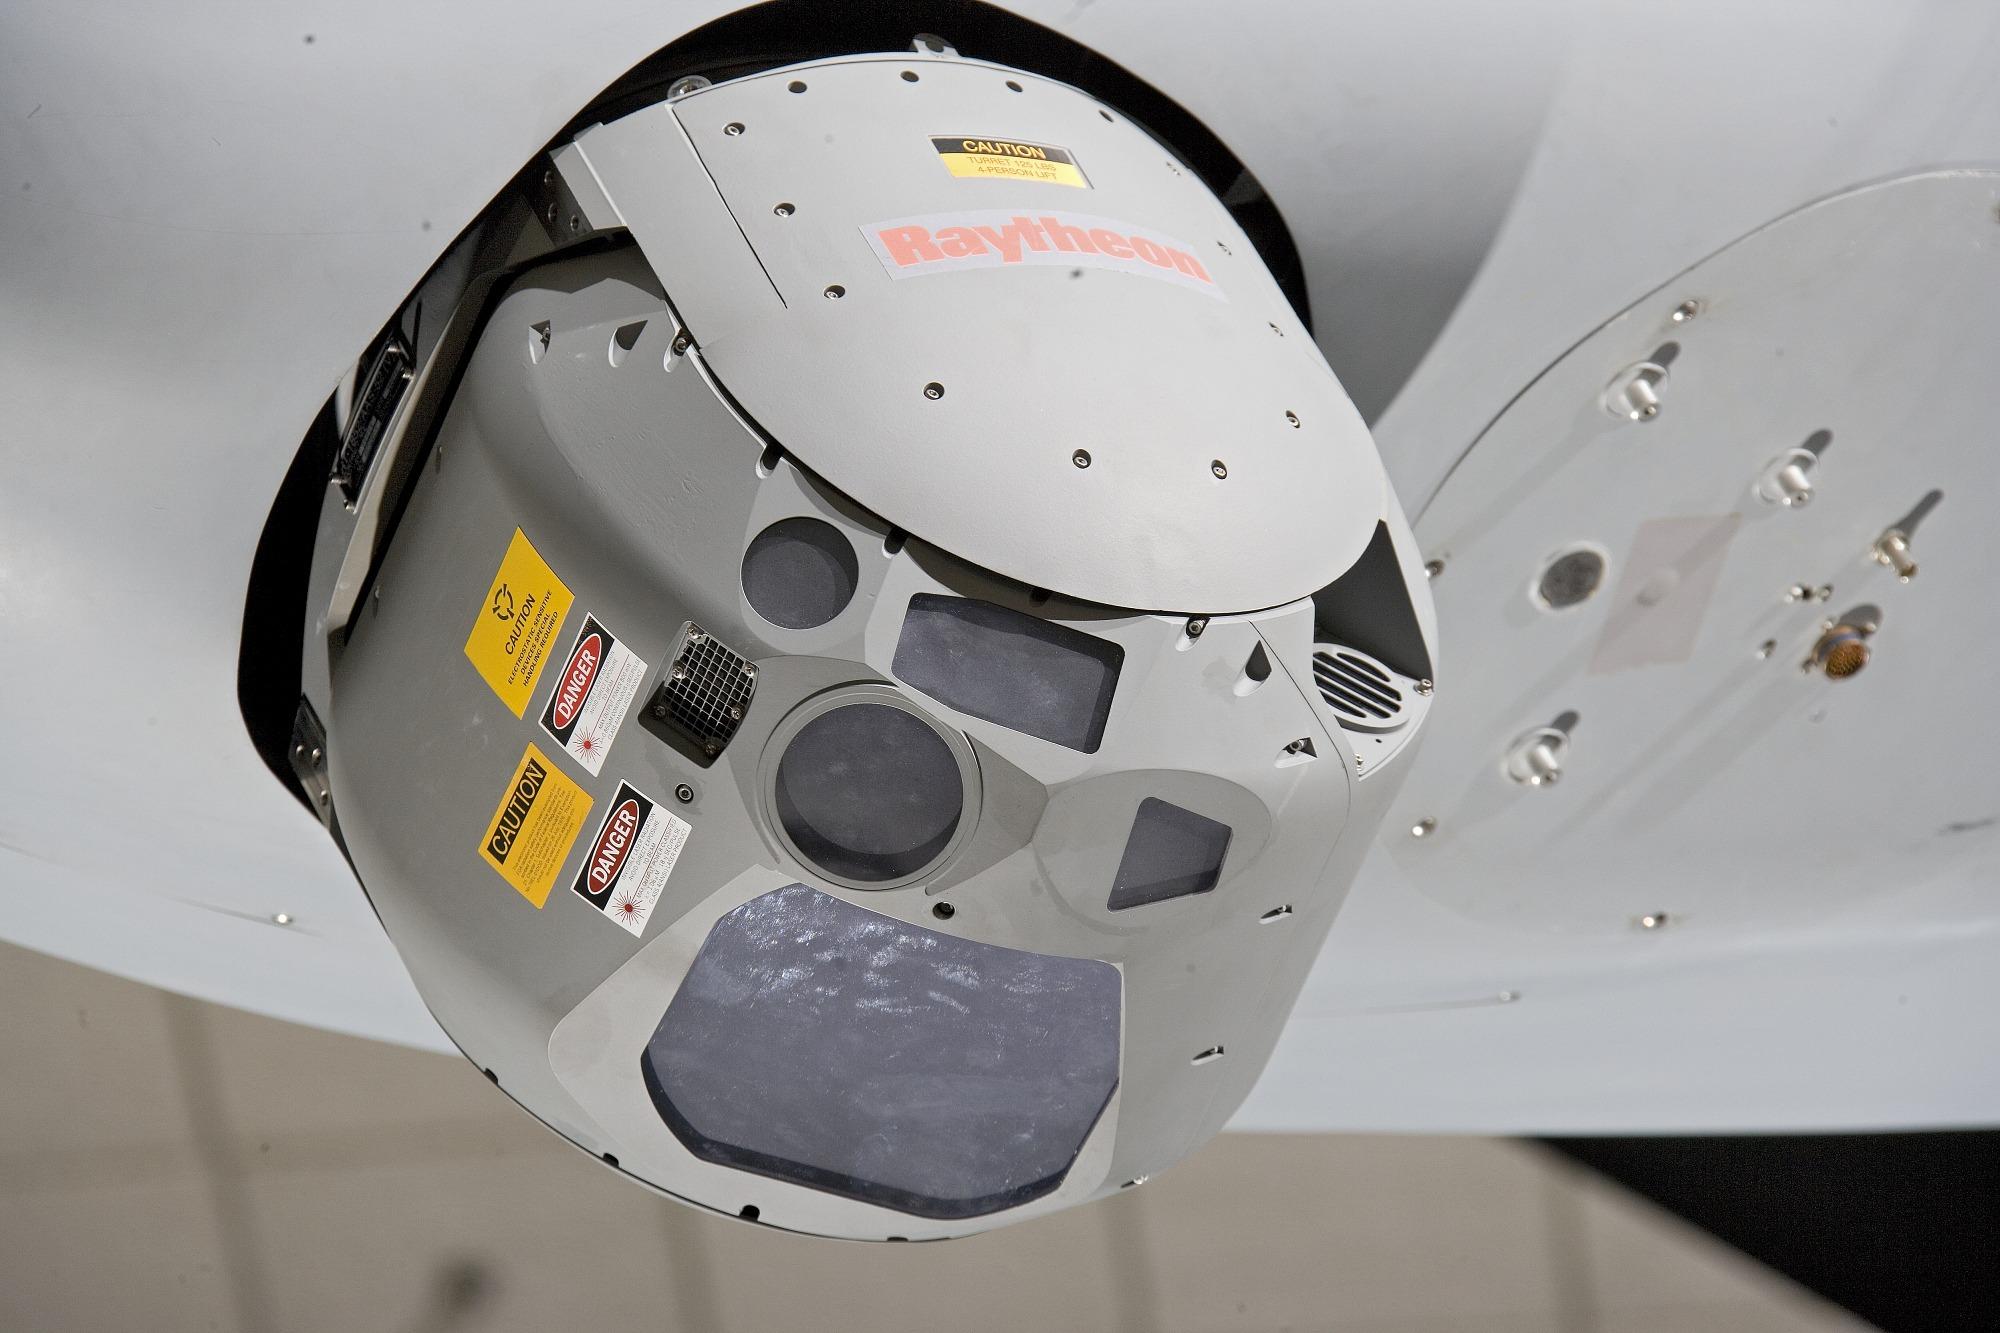 UAV, General Atomics MQ-1L Predator A | National Air and